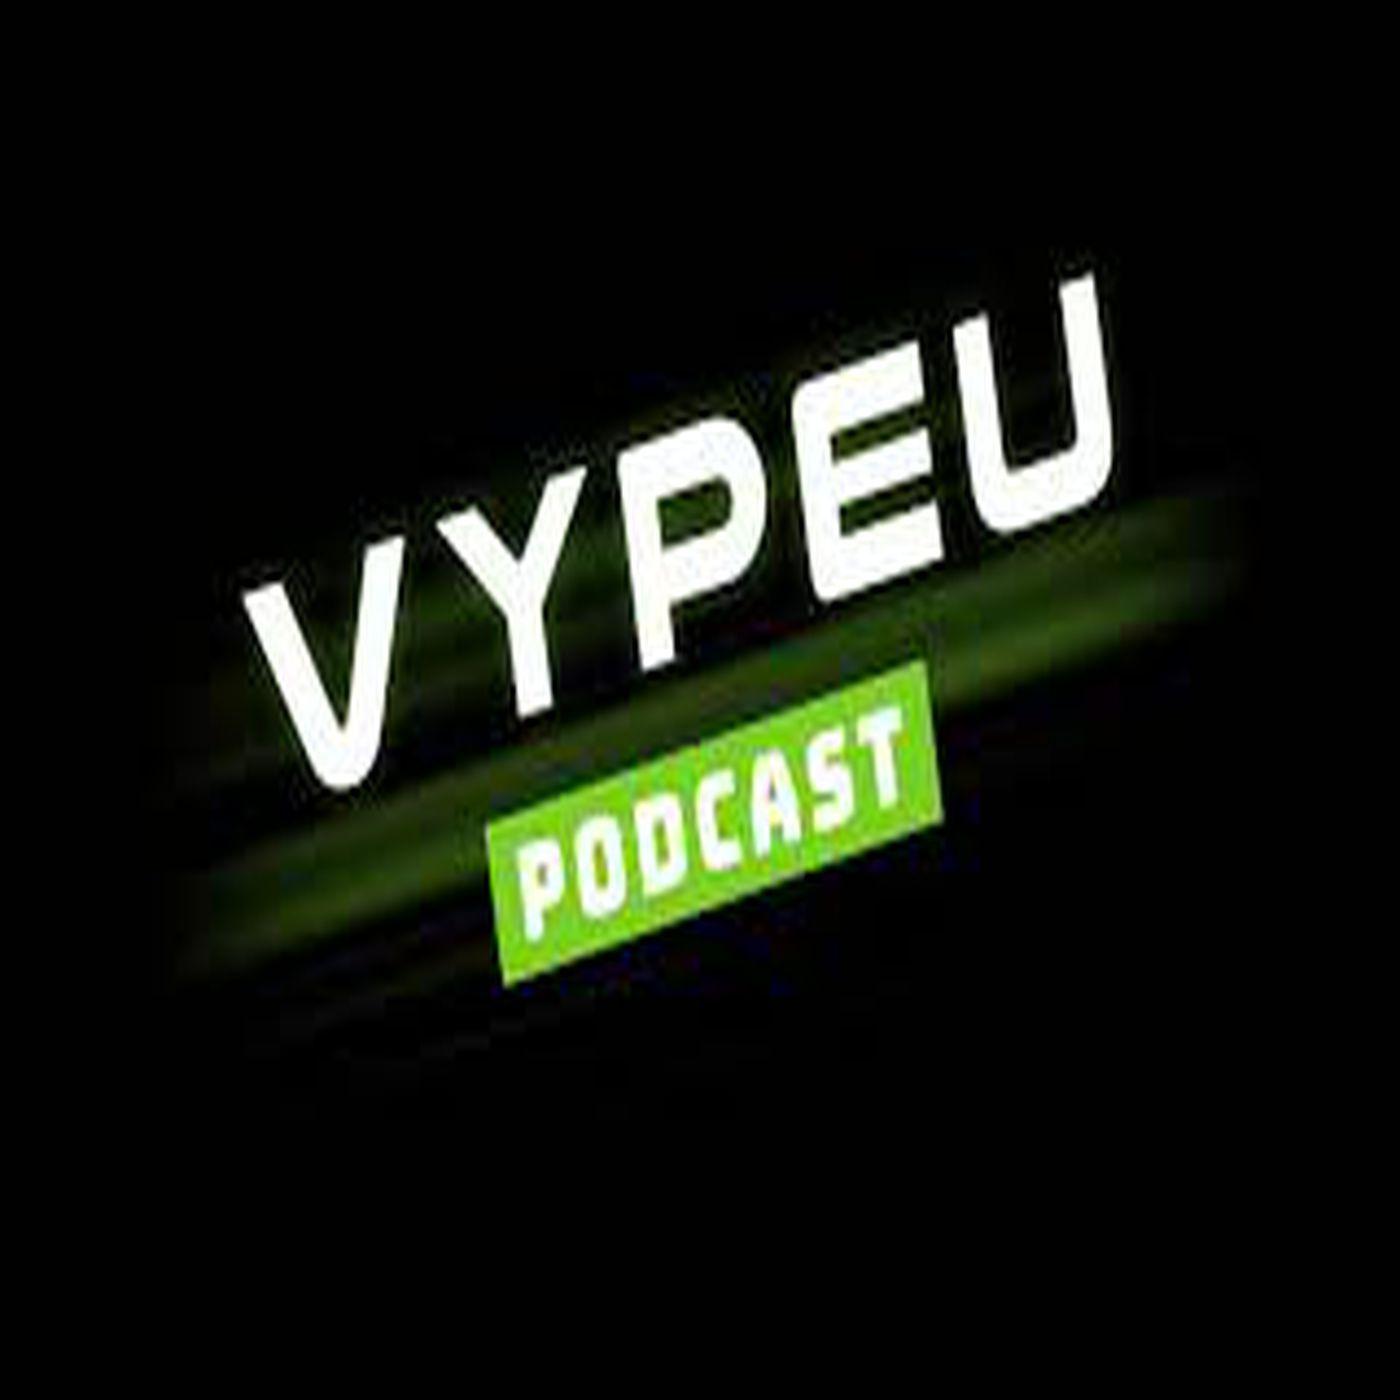 The VYPE U Podcast